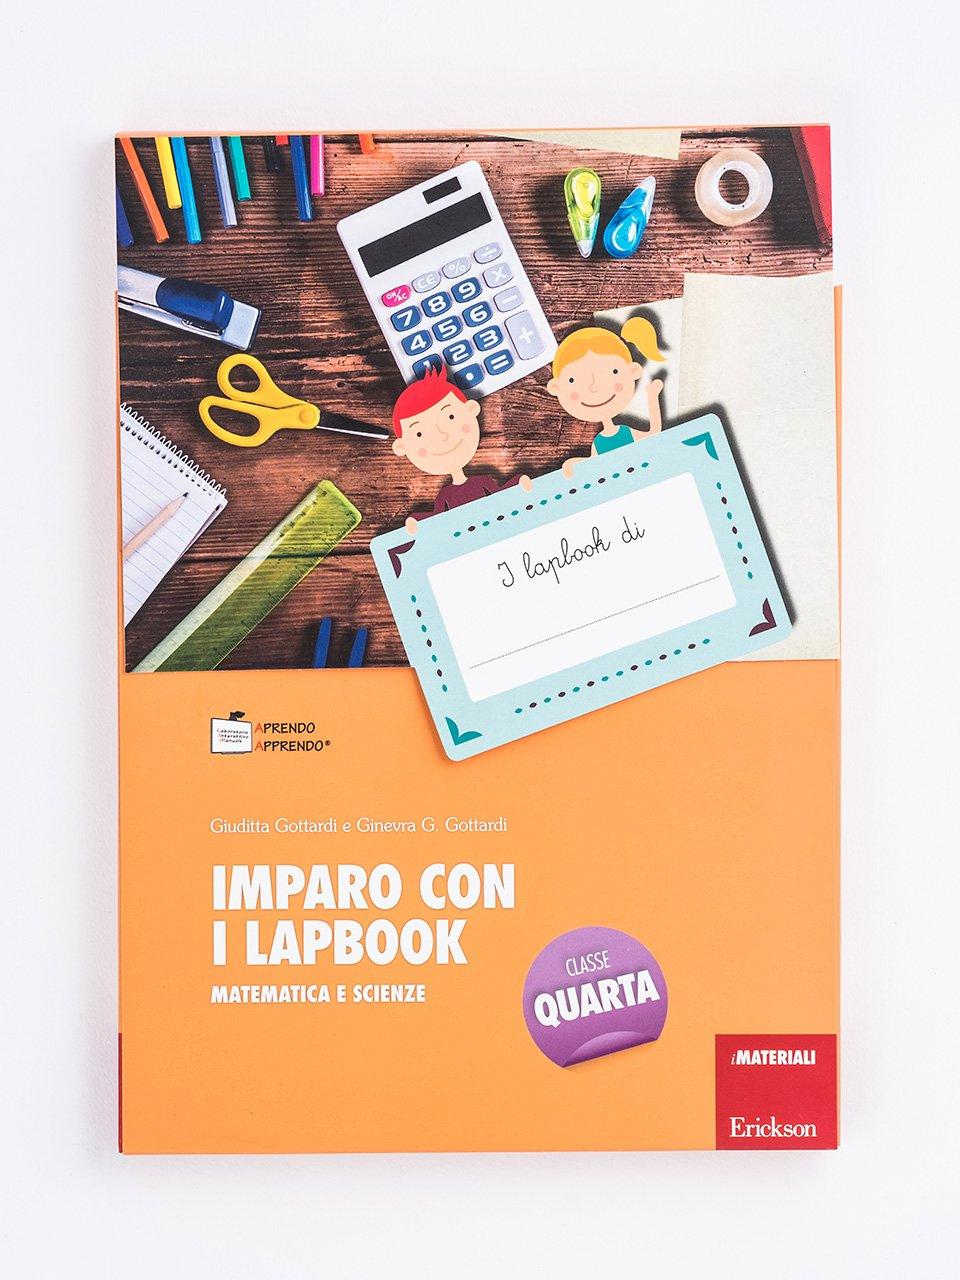 Imparo con i lapbook - Matematica e scienze - Classe quarta - Ginevra G. Gottardi - Erickson